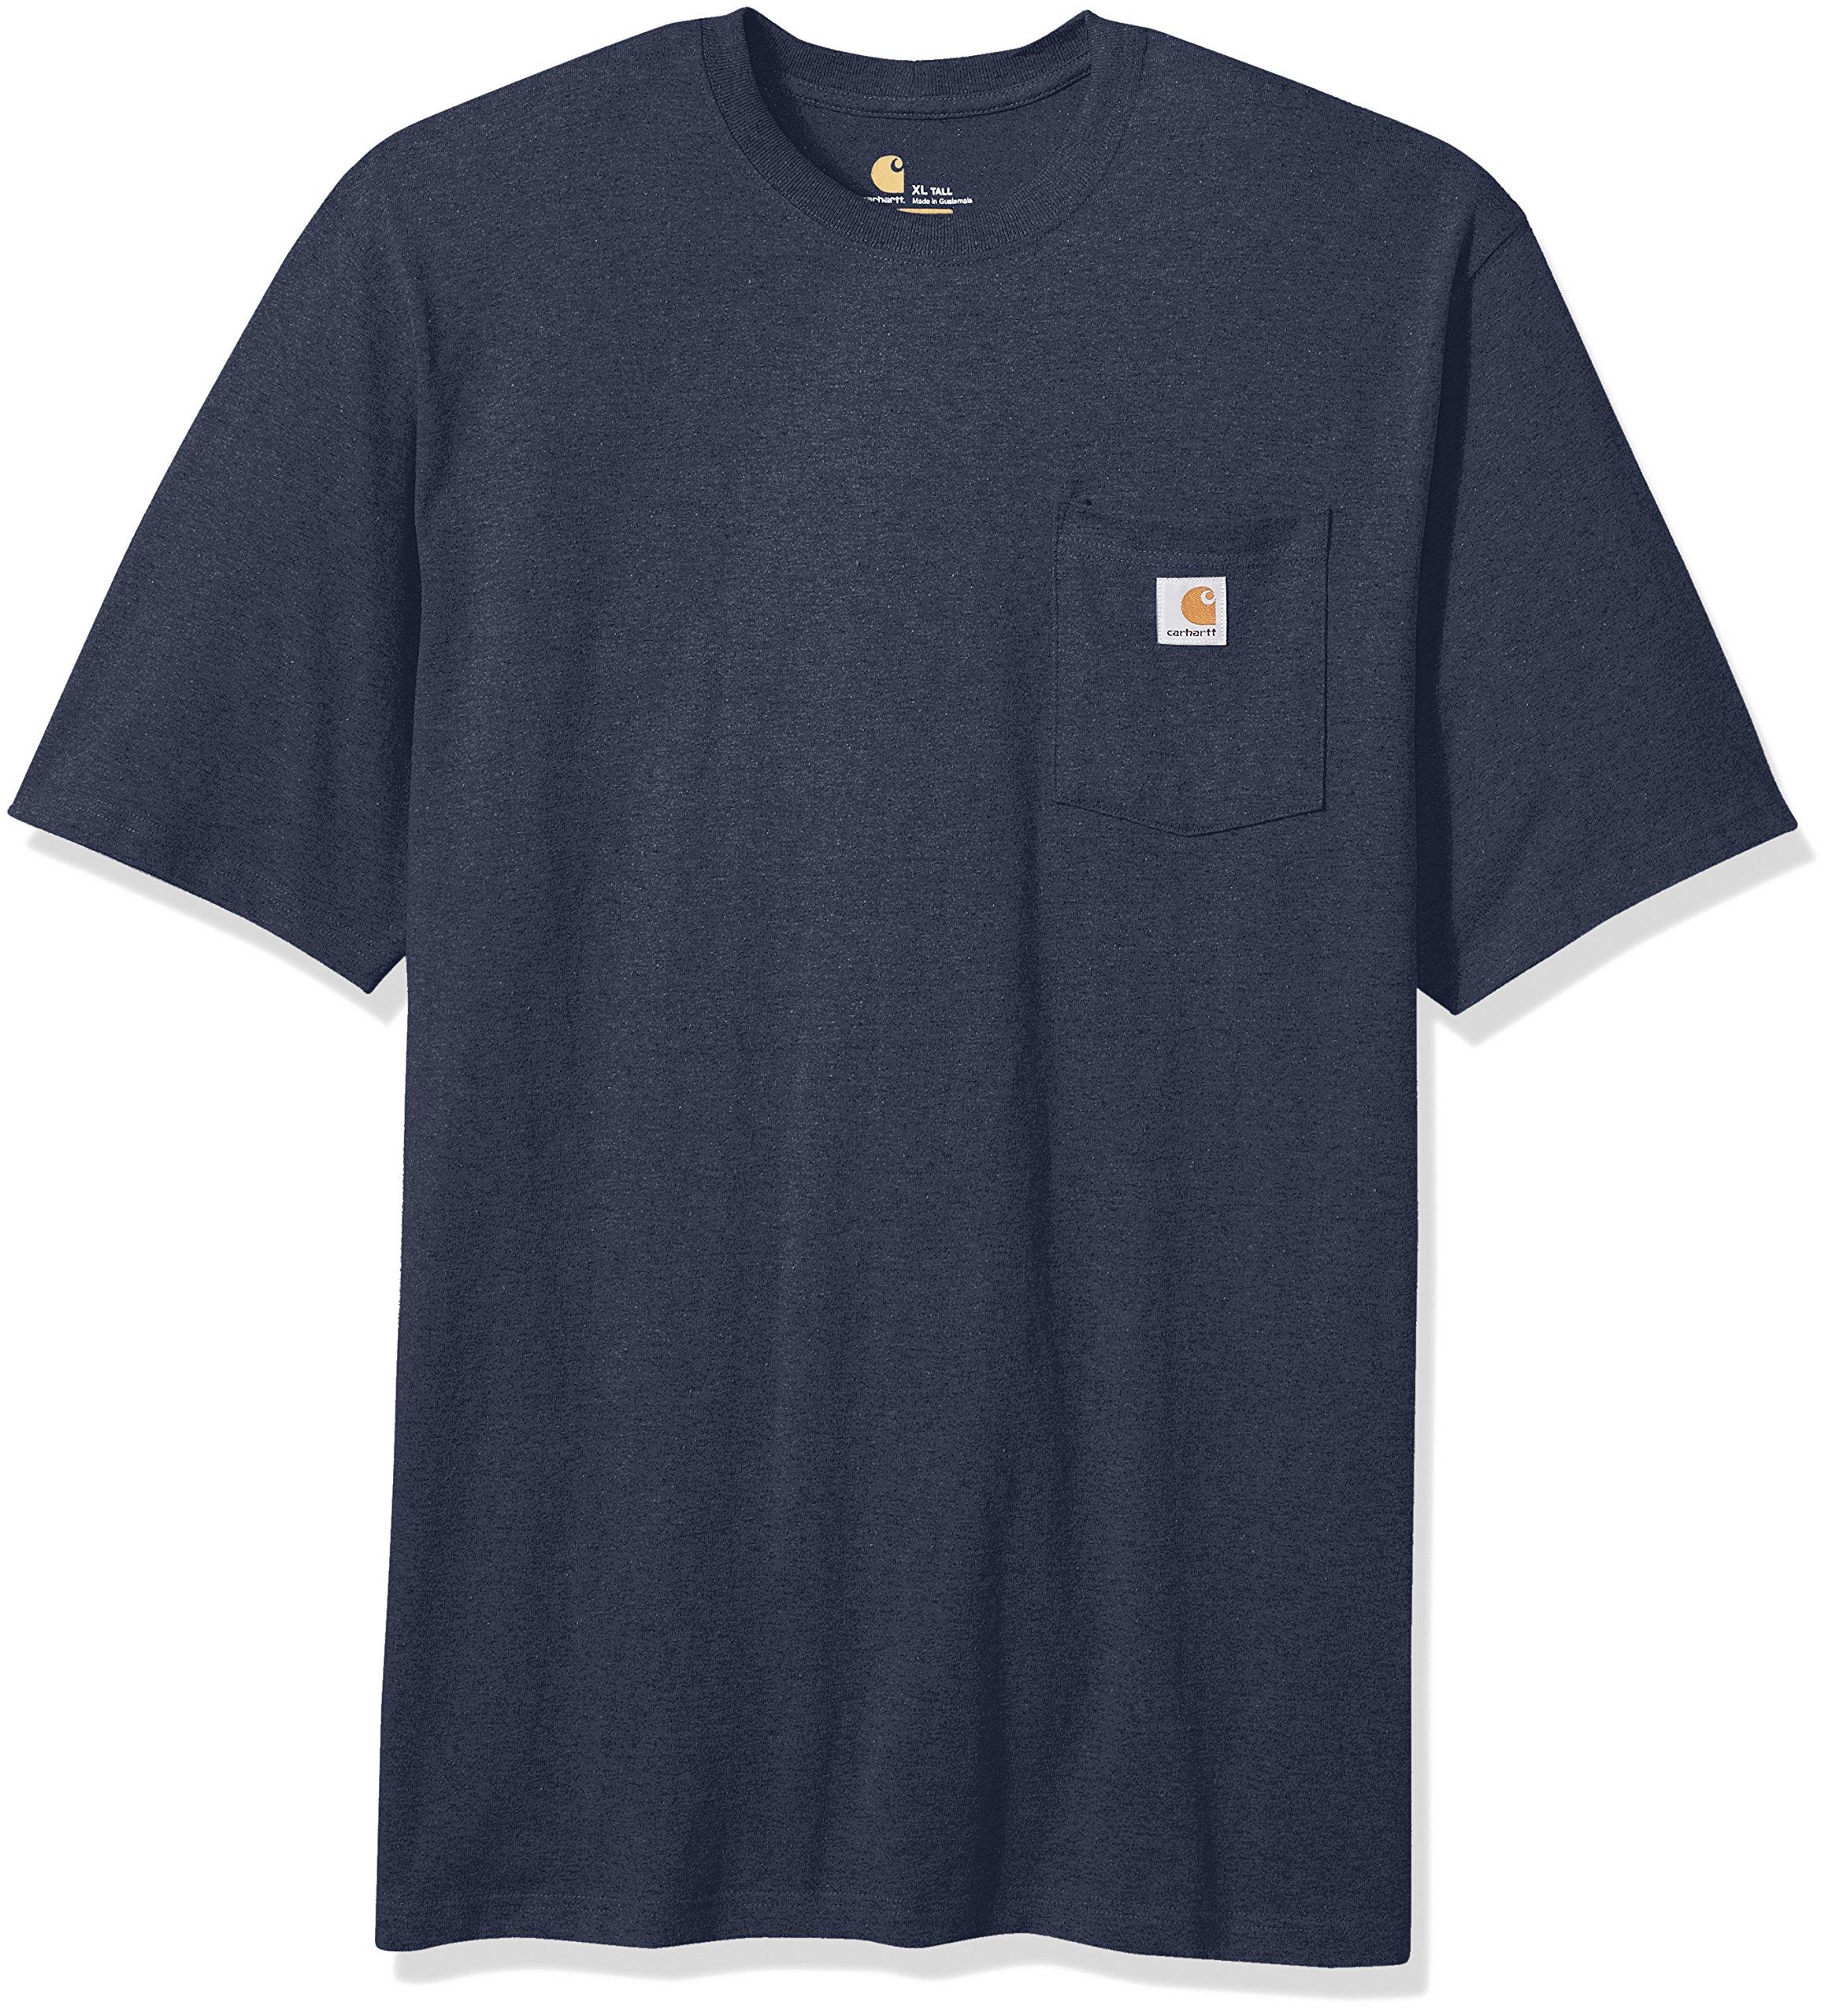 Carhartt Men's Big and Tall Big & Tall K87 Workwear Pocket Short Sleeve T Shirt, Navy Heather 3X-Large